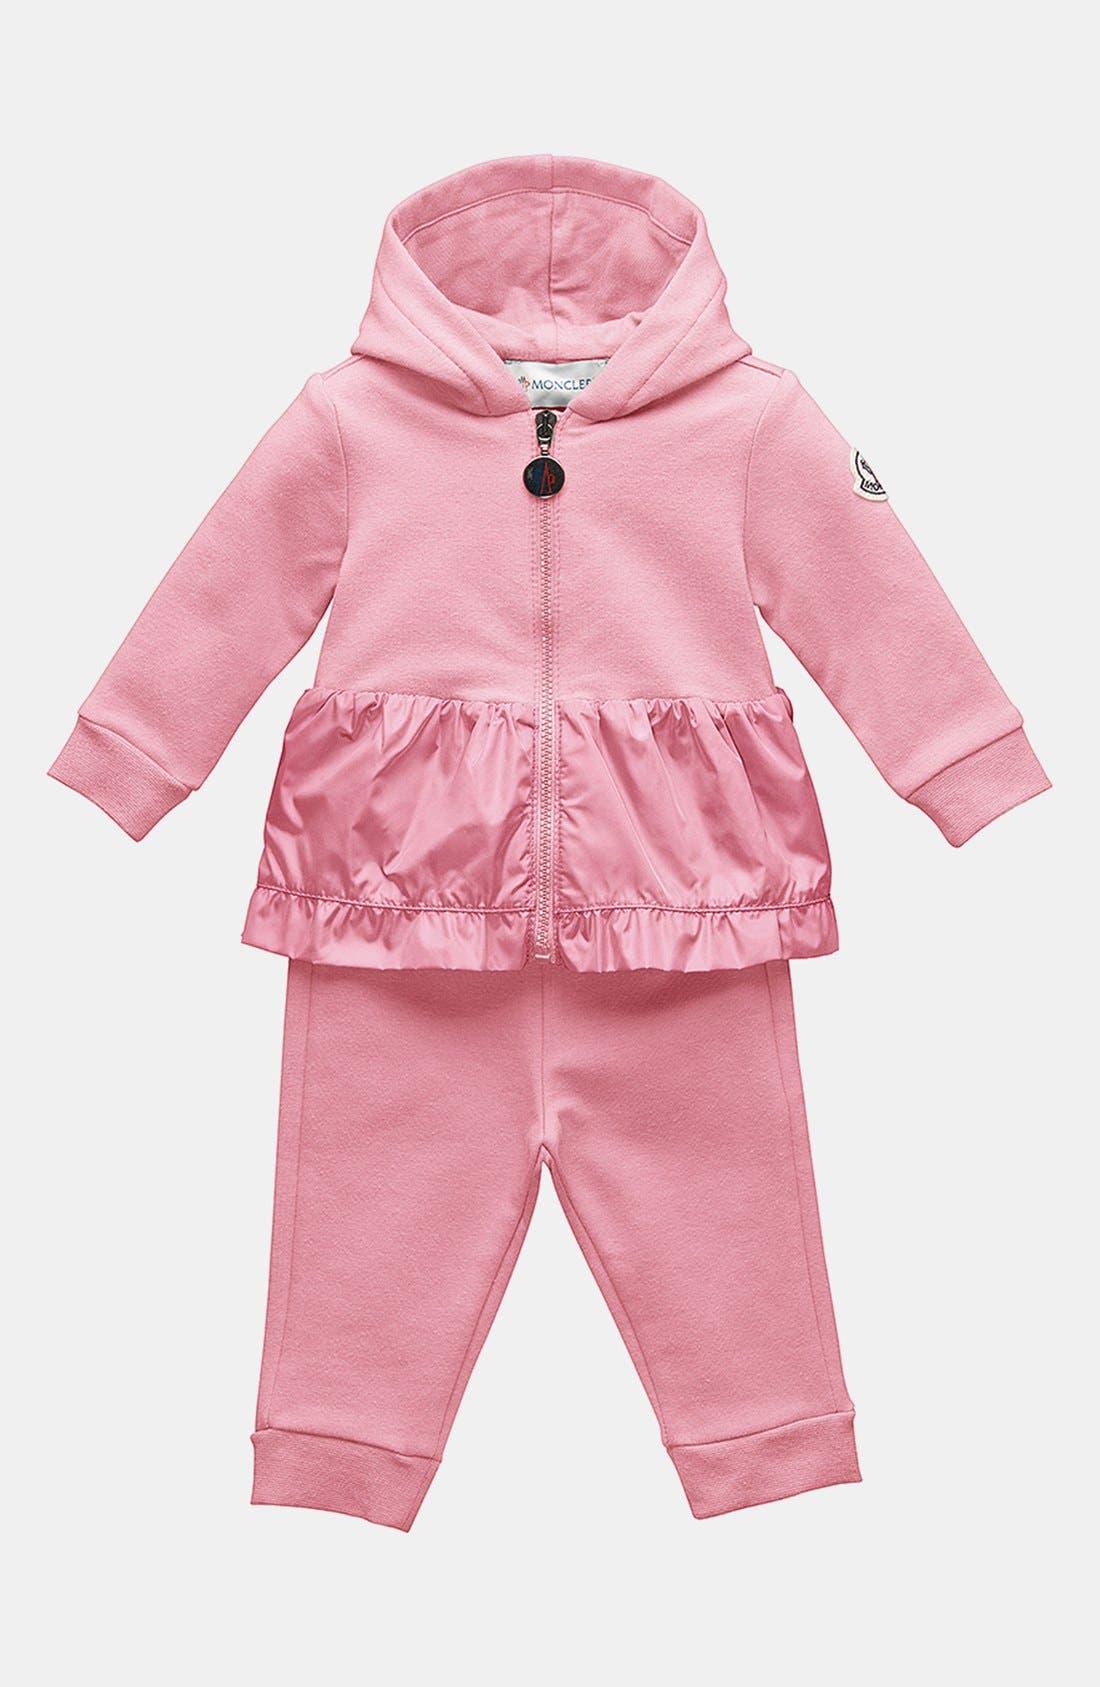 Main Image - Moncler Jacket & Pants (Baby Girls)